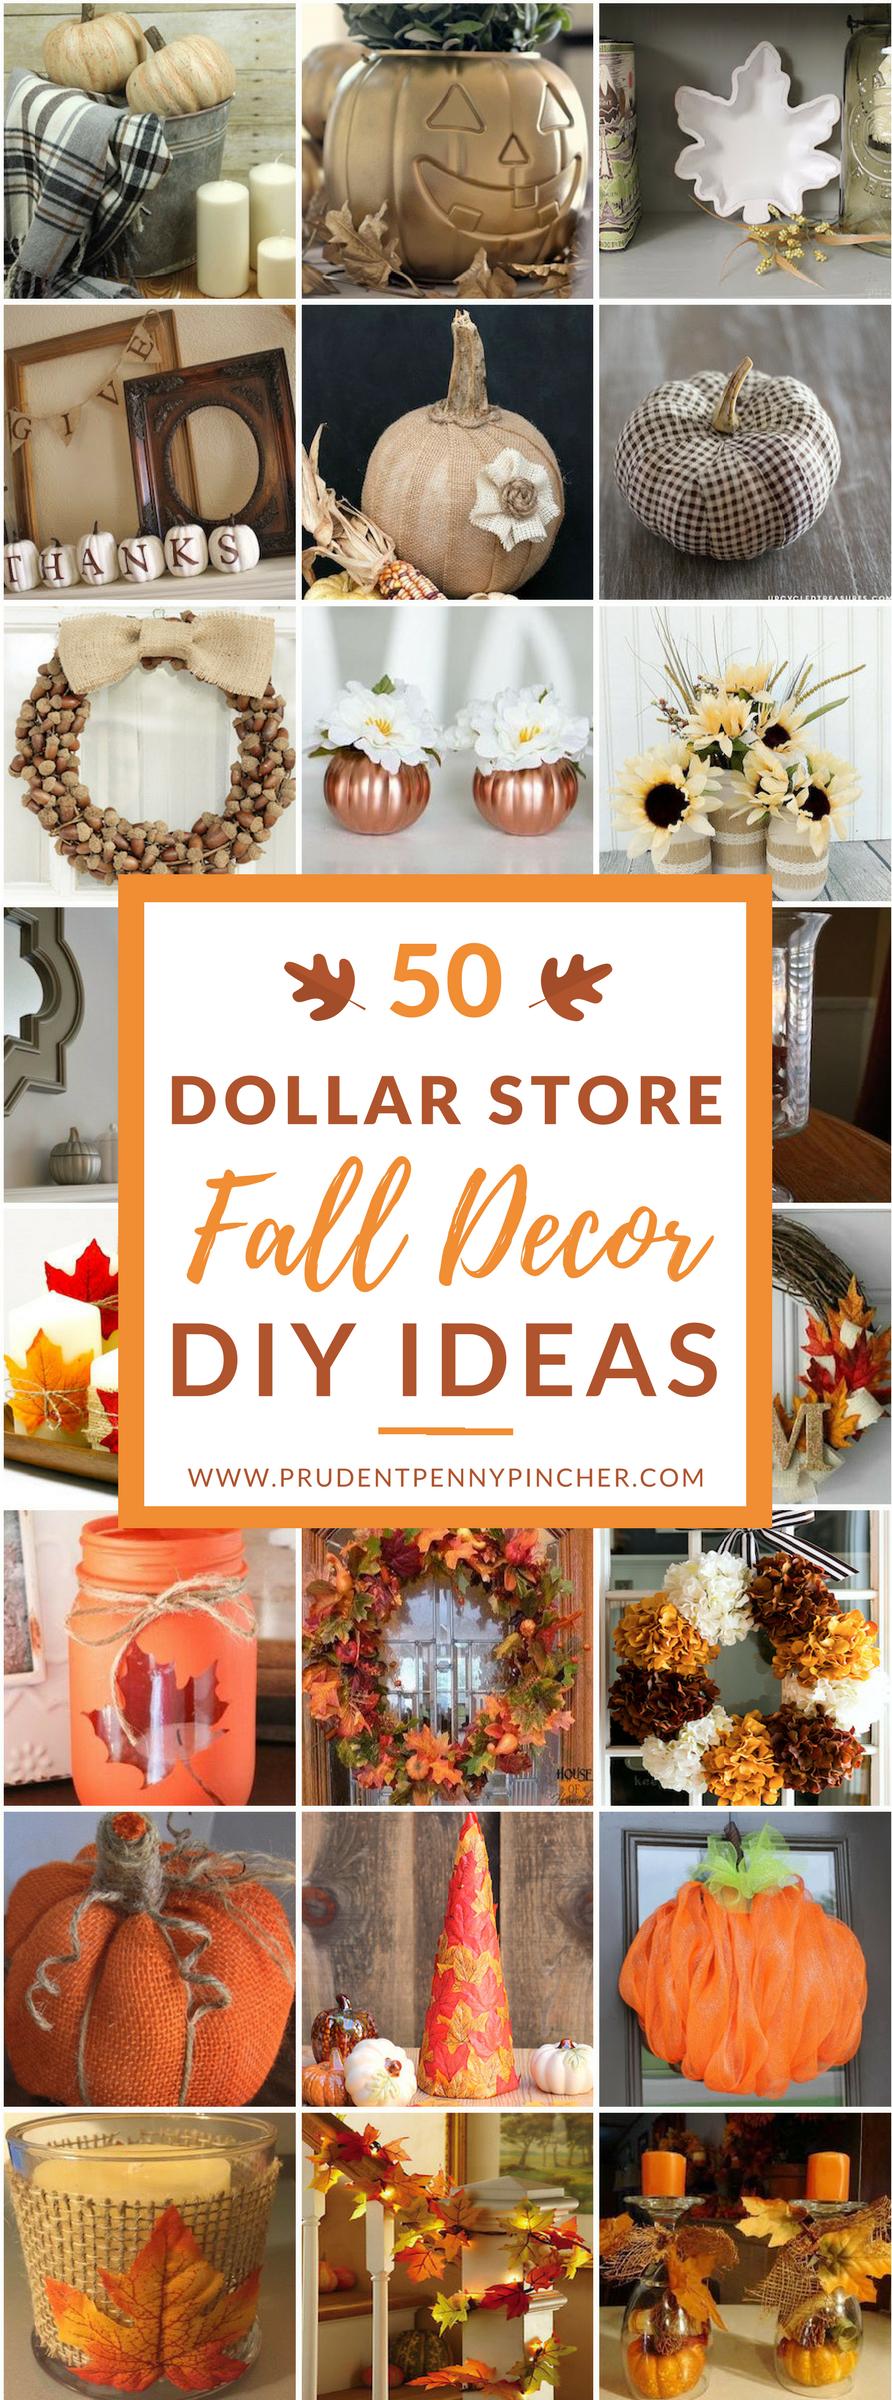 50 Dollar Store Fall Decor Ideas Fall crafts, Dollar